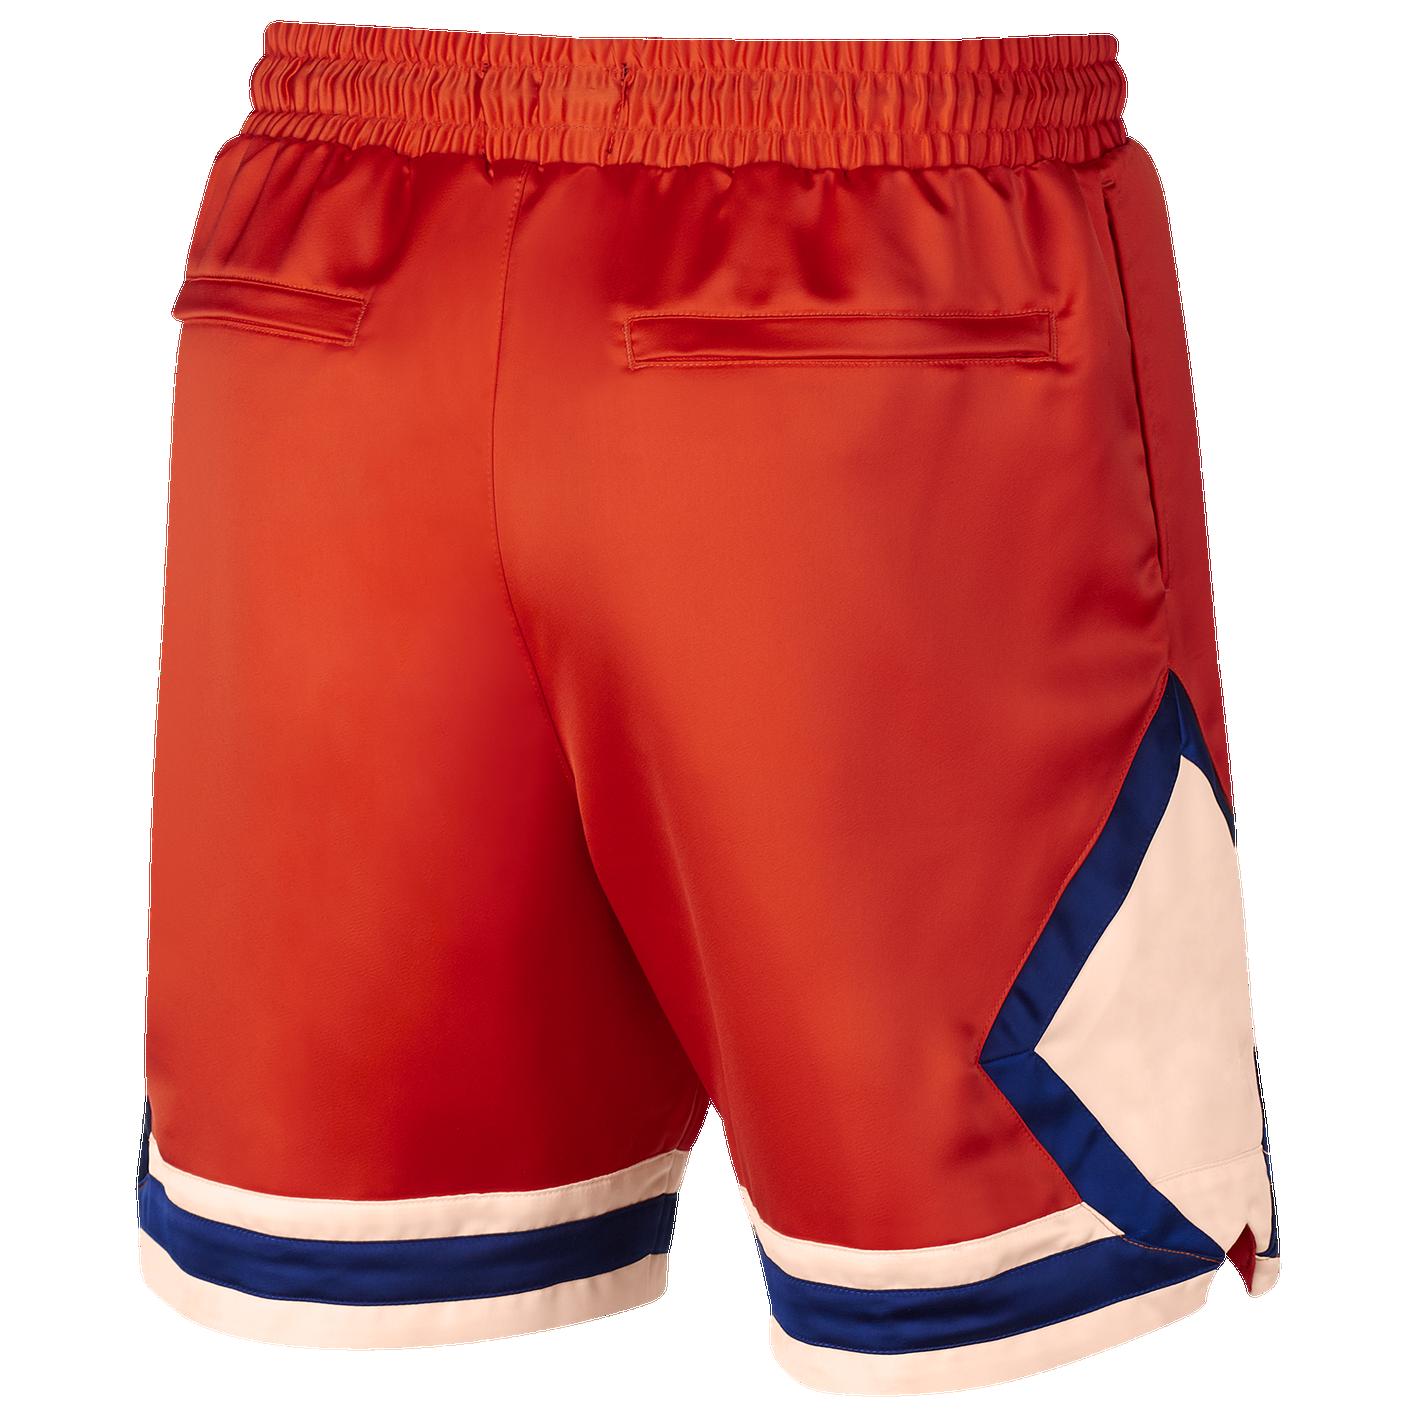 8b1682f645a Jordan Satin Diamond Shorts - Men's - Casual - Clothing - Team ...